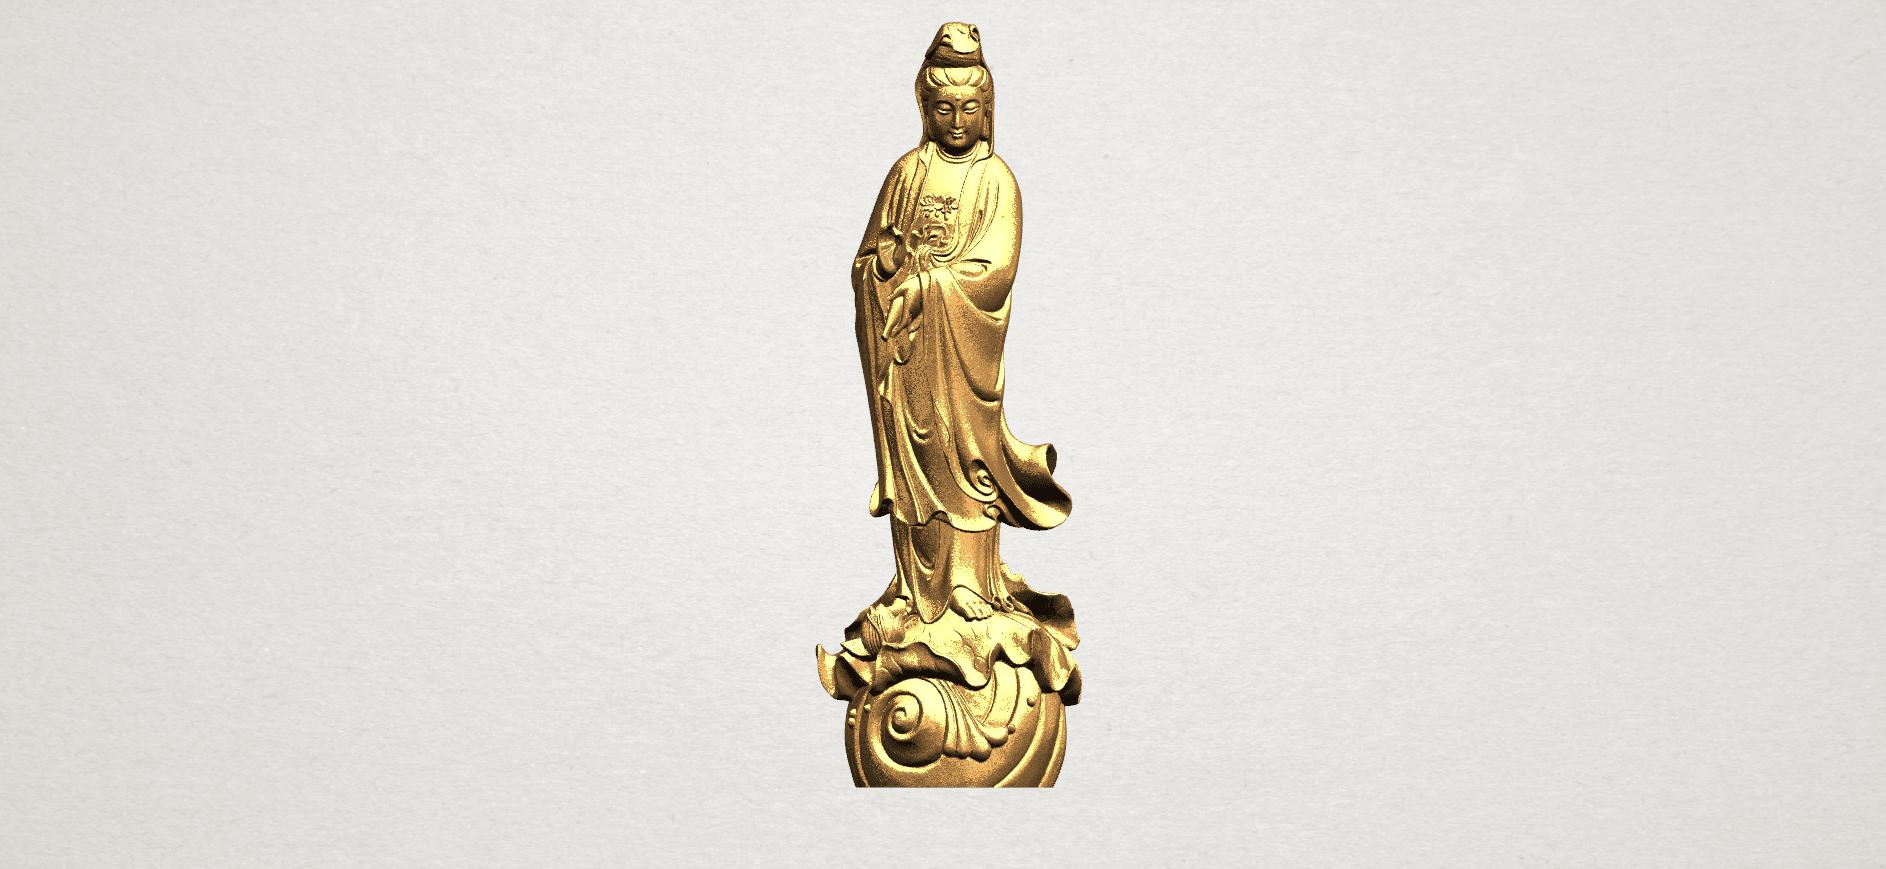 Avalokitesvara Buddha - Standing (i) A01.png Download free STL file Avalokitesvara Bodhisattva - Standing 01 • 3D printable design, GeorgesNikkei